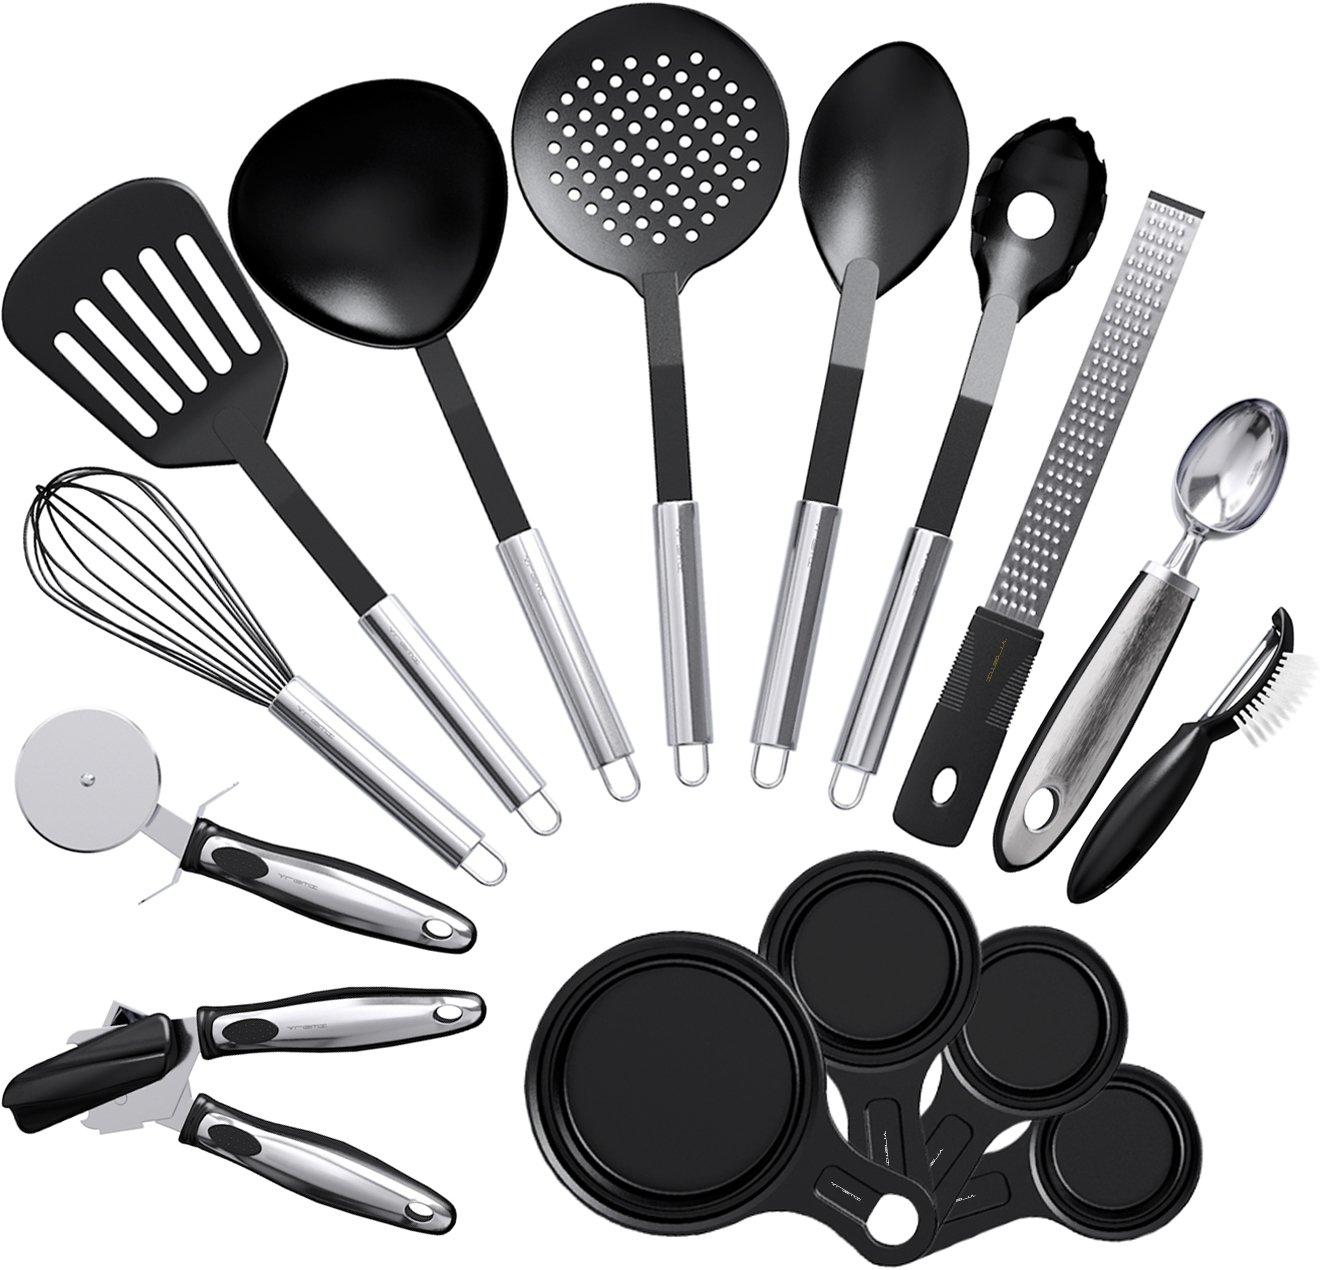 Vremi 15 Piece Kitchen Gadgets Cooking Utensils Set - Kitchen Gadgets and Tools Cooking Utensil Set - Unique Fun Cool Kitchen Gadgets with Plastic Cooking Utensils - Cute Useful Kitchen Gadget Sets